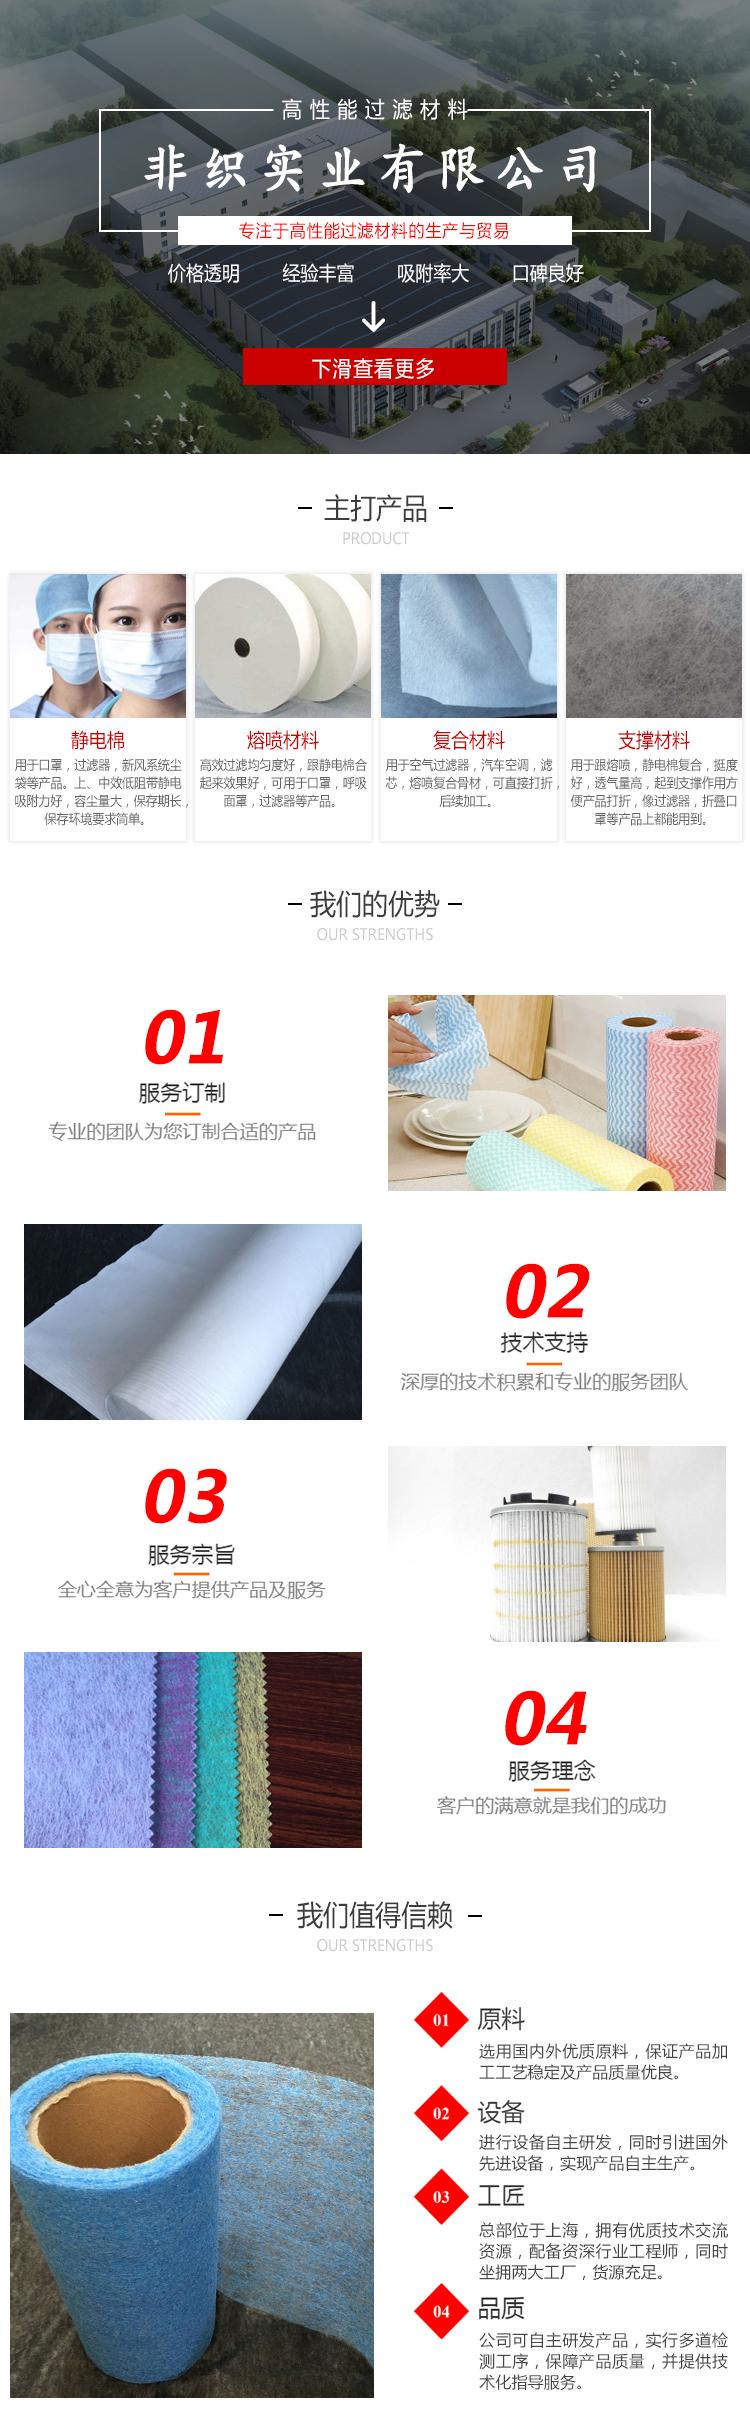 http://www.edaojz.cn/qichexingye/910959.html